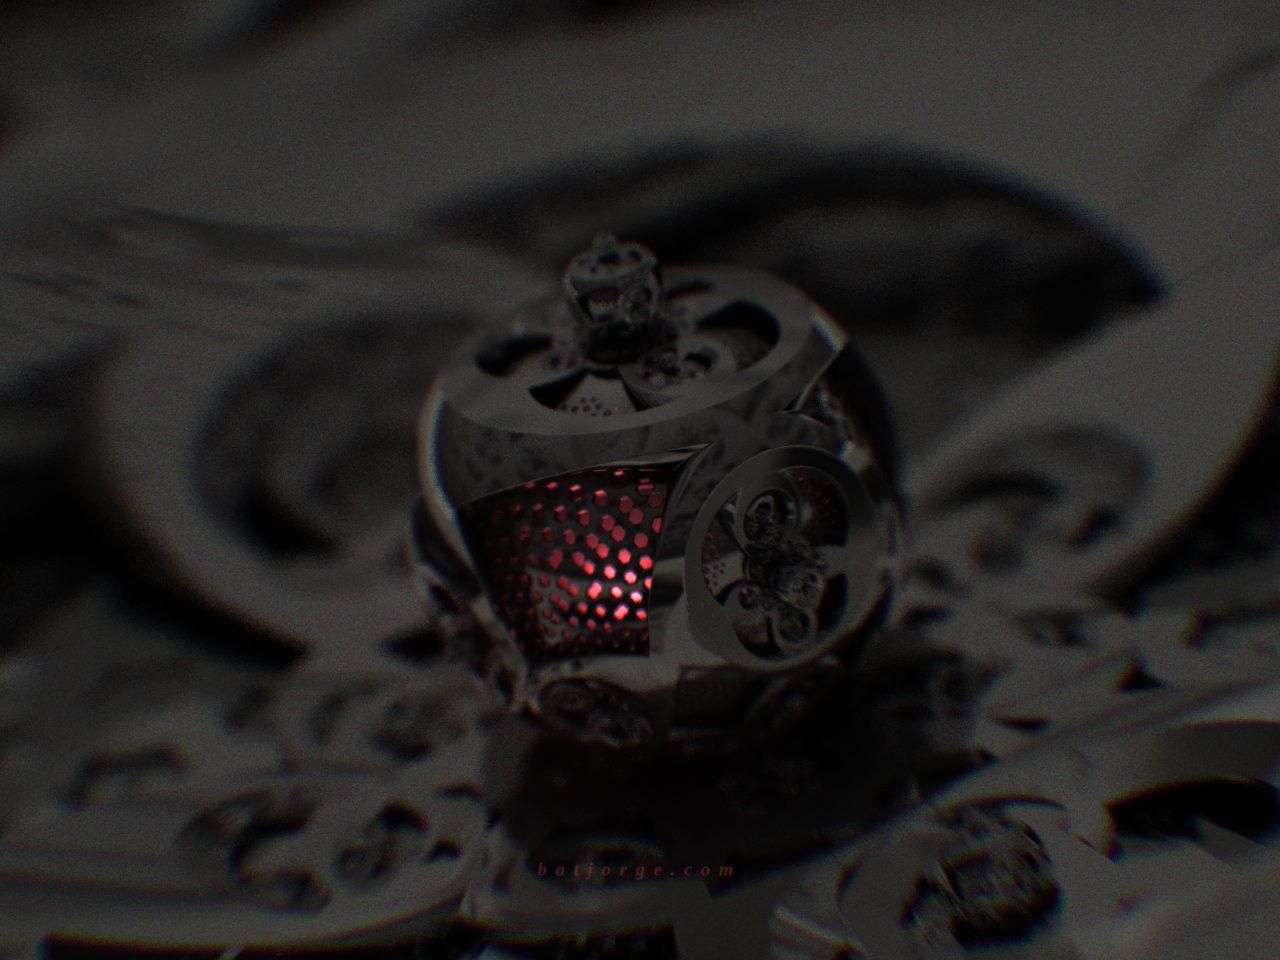 3D fractal orb. mandelbulber kleinian dark